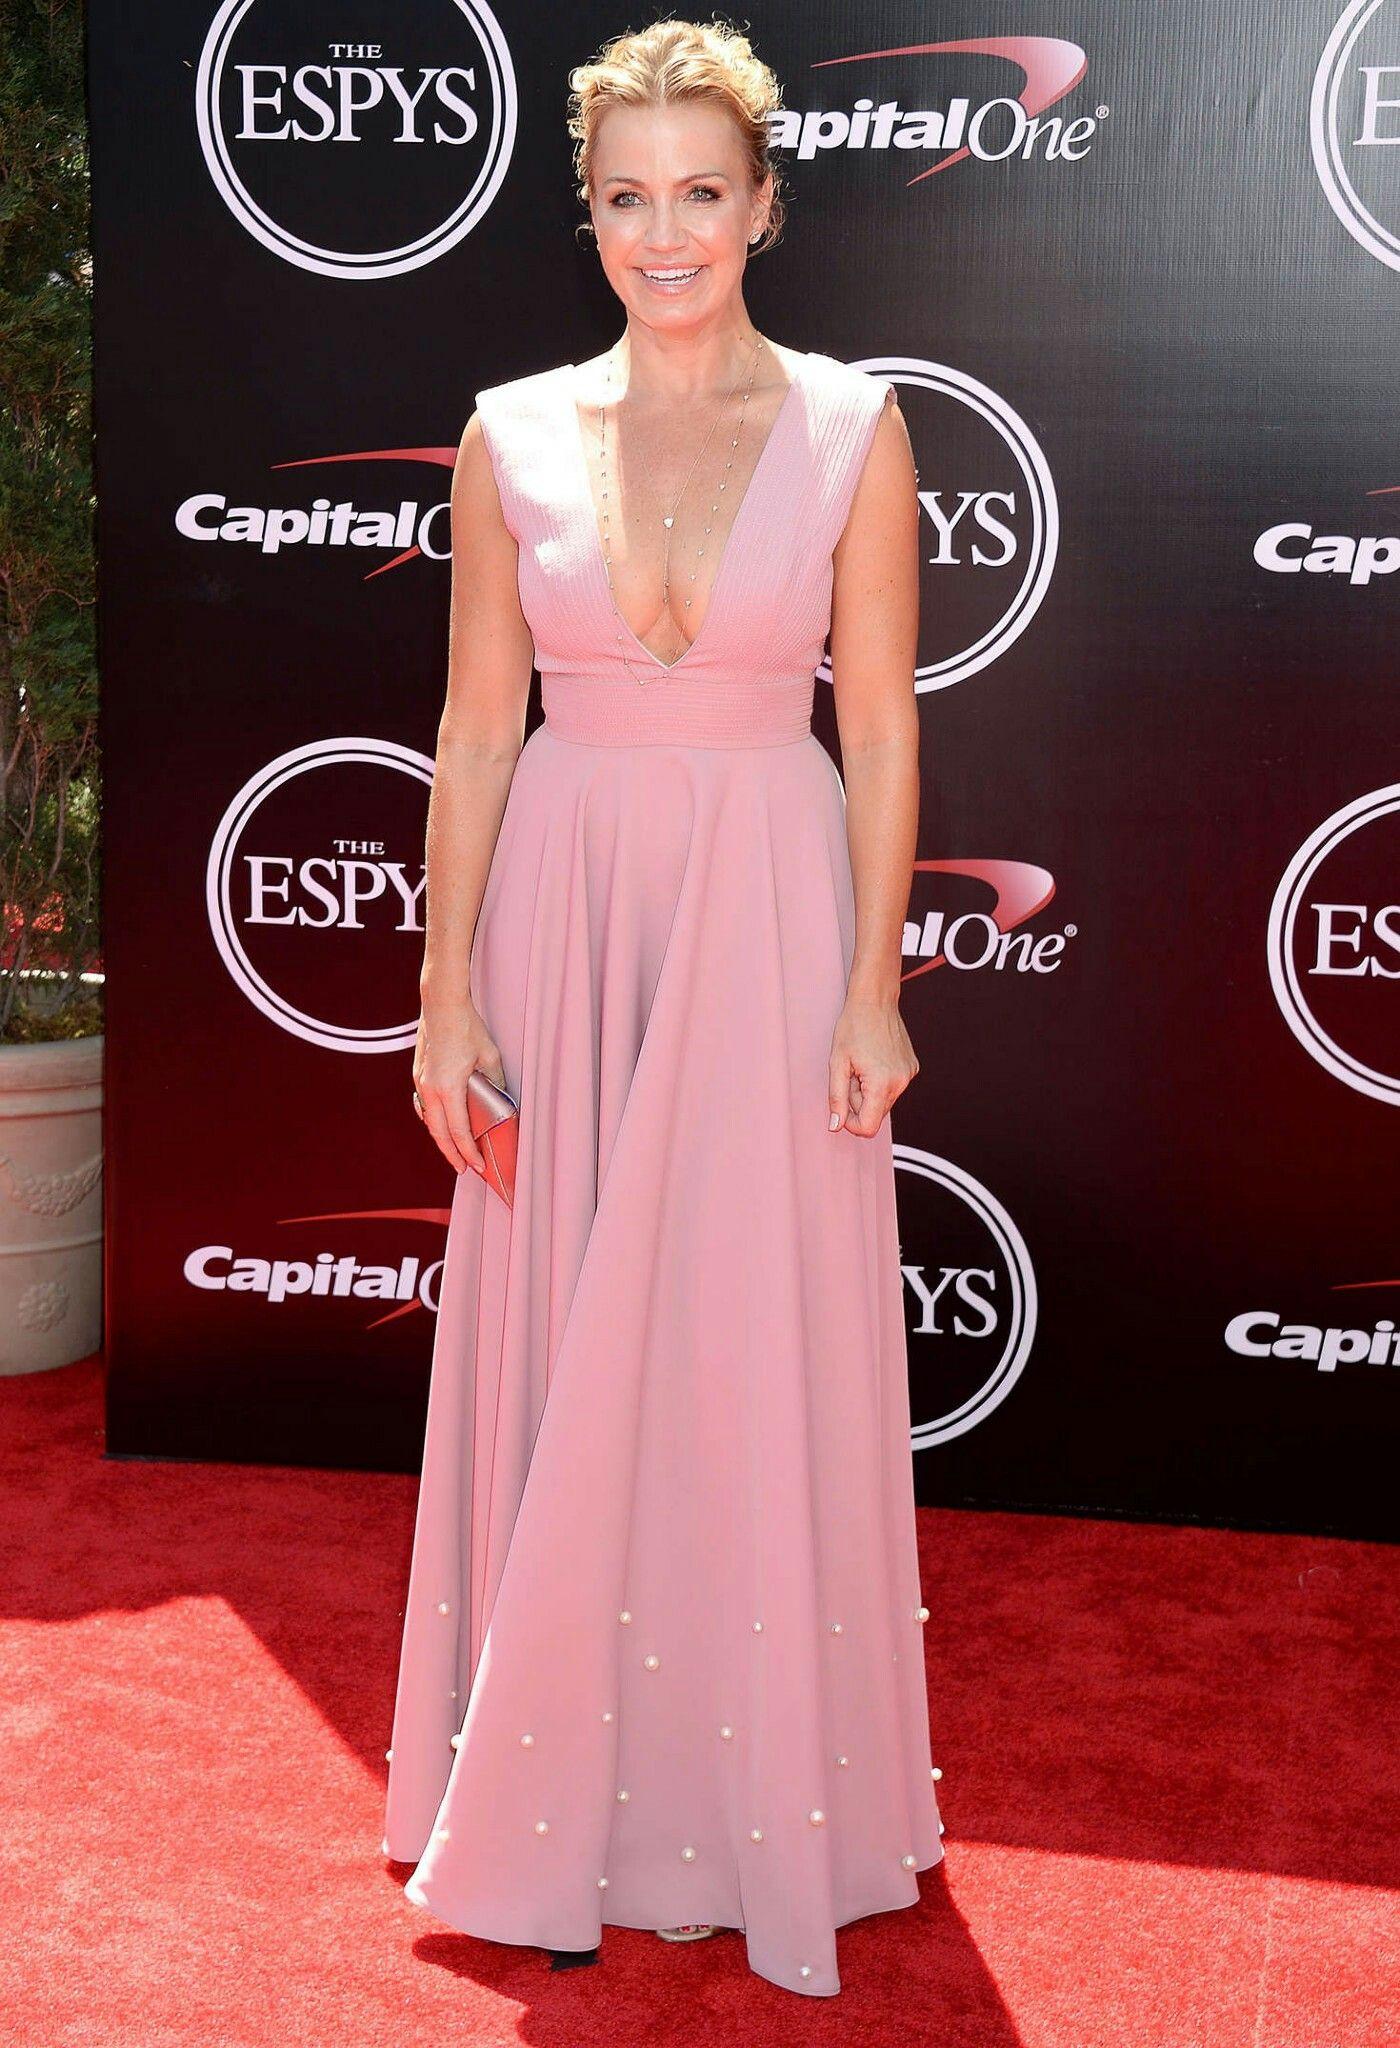 Michelle Beadle | Formal dresses long, Pretty celebrities, Dress to impress